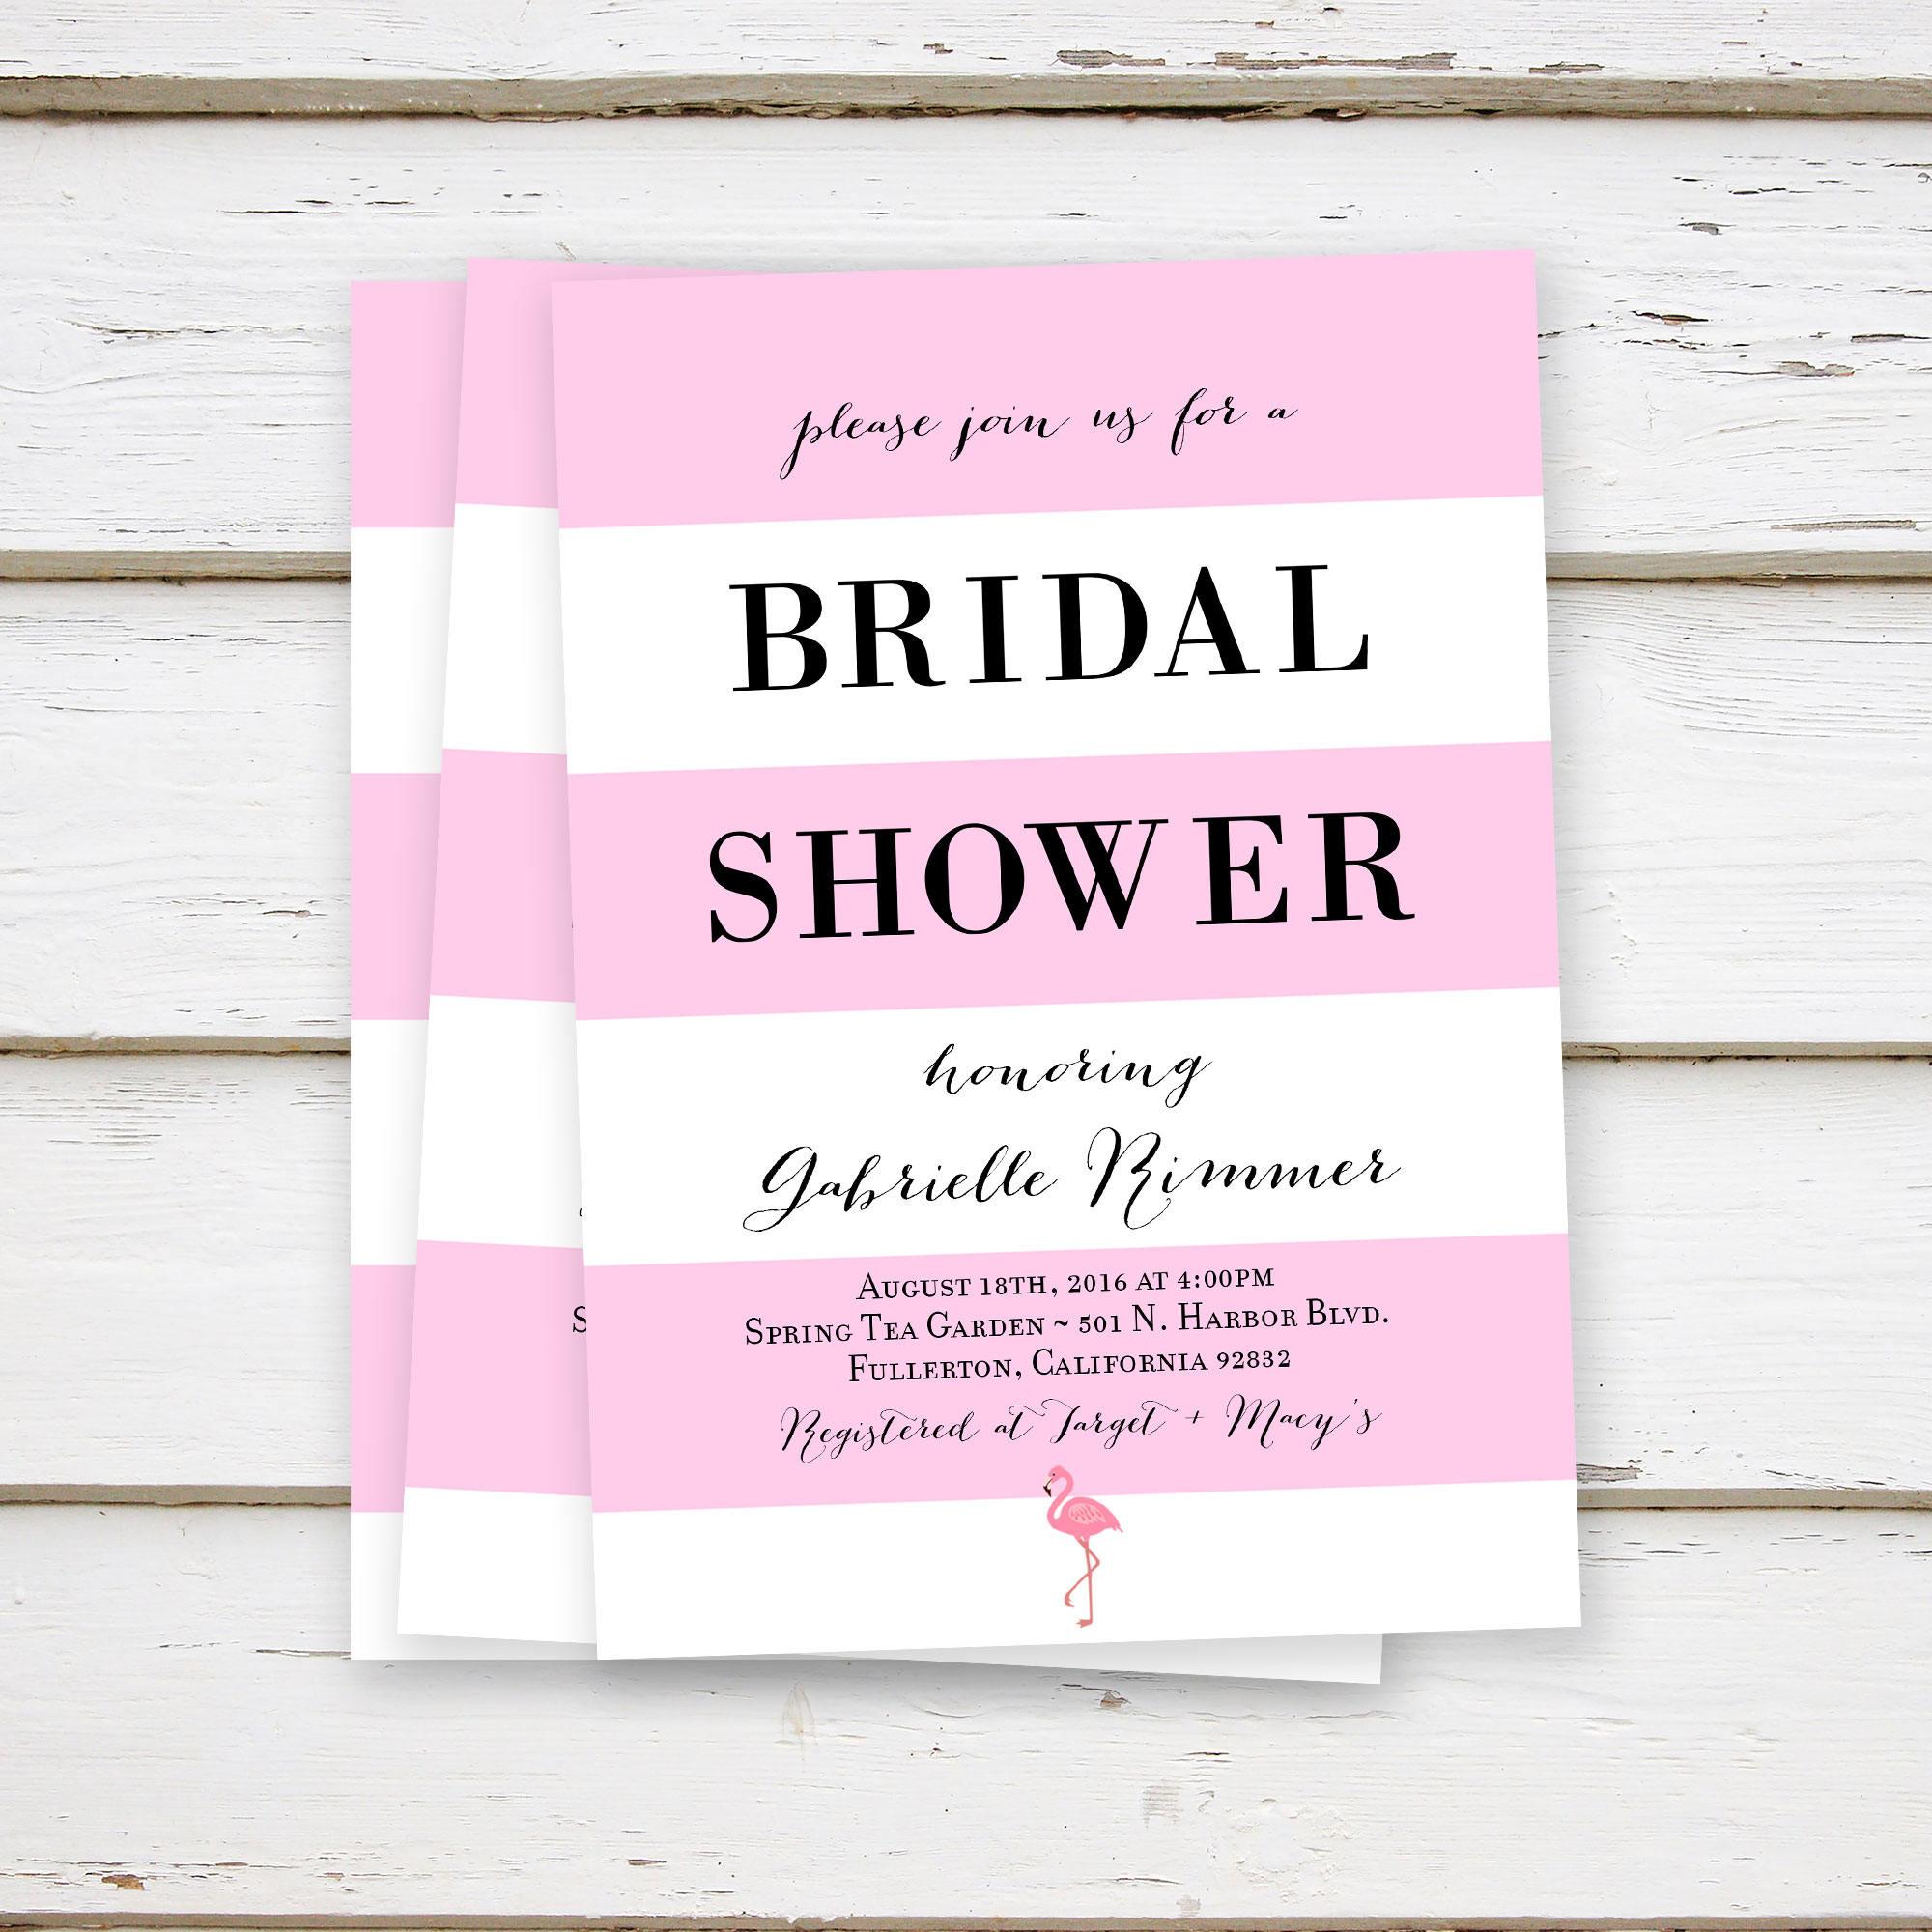 PRINTED Tropical Bridal Shower Invitations, Pink White Black ...